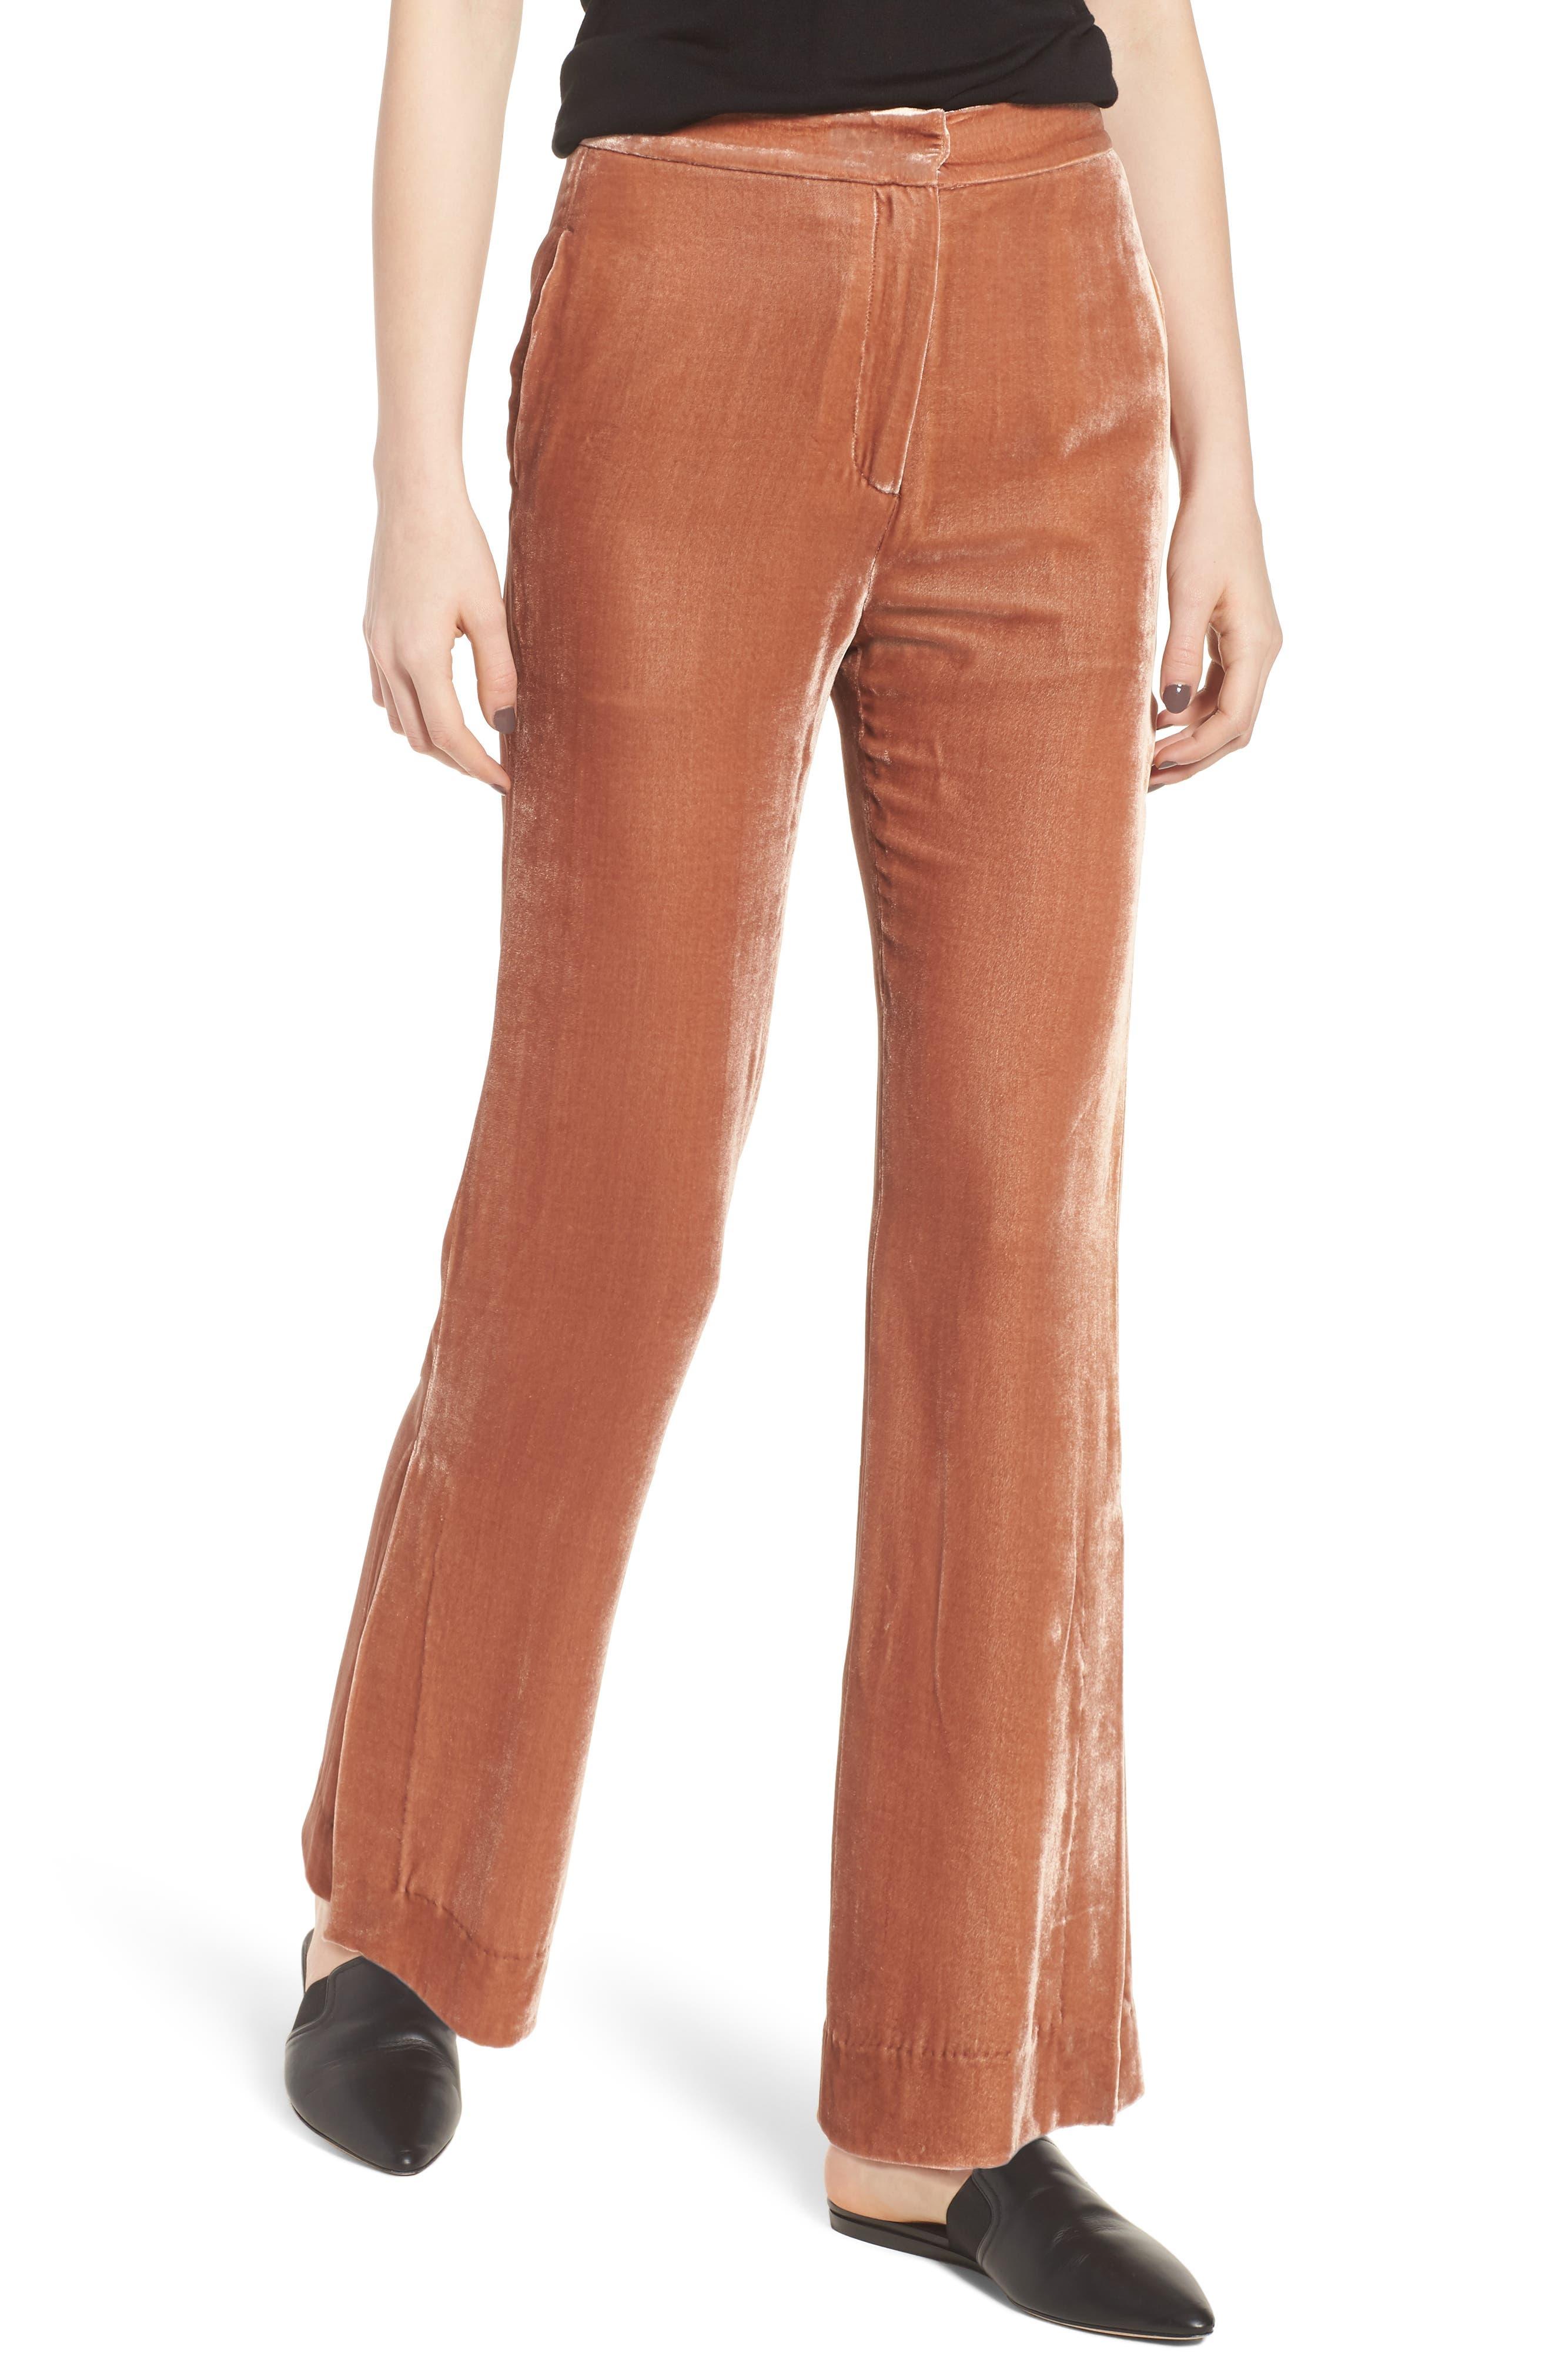 Bushwick Velvet Pants,                             Main thumbnail 1, color,                             Brown